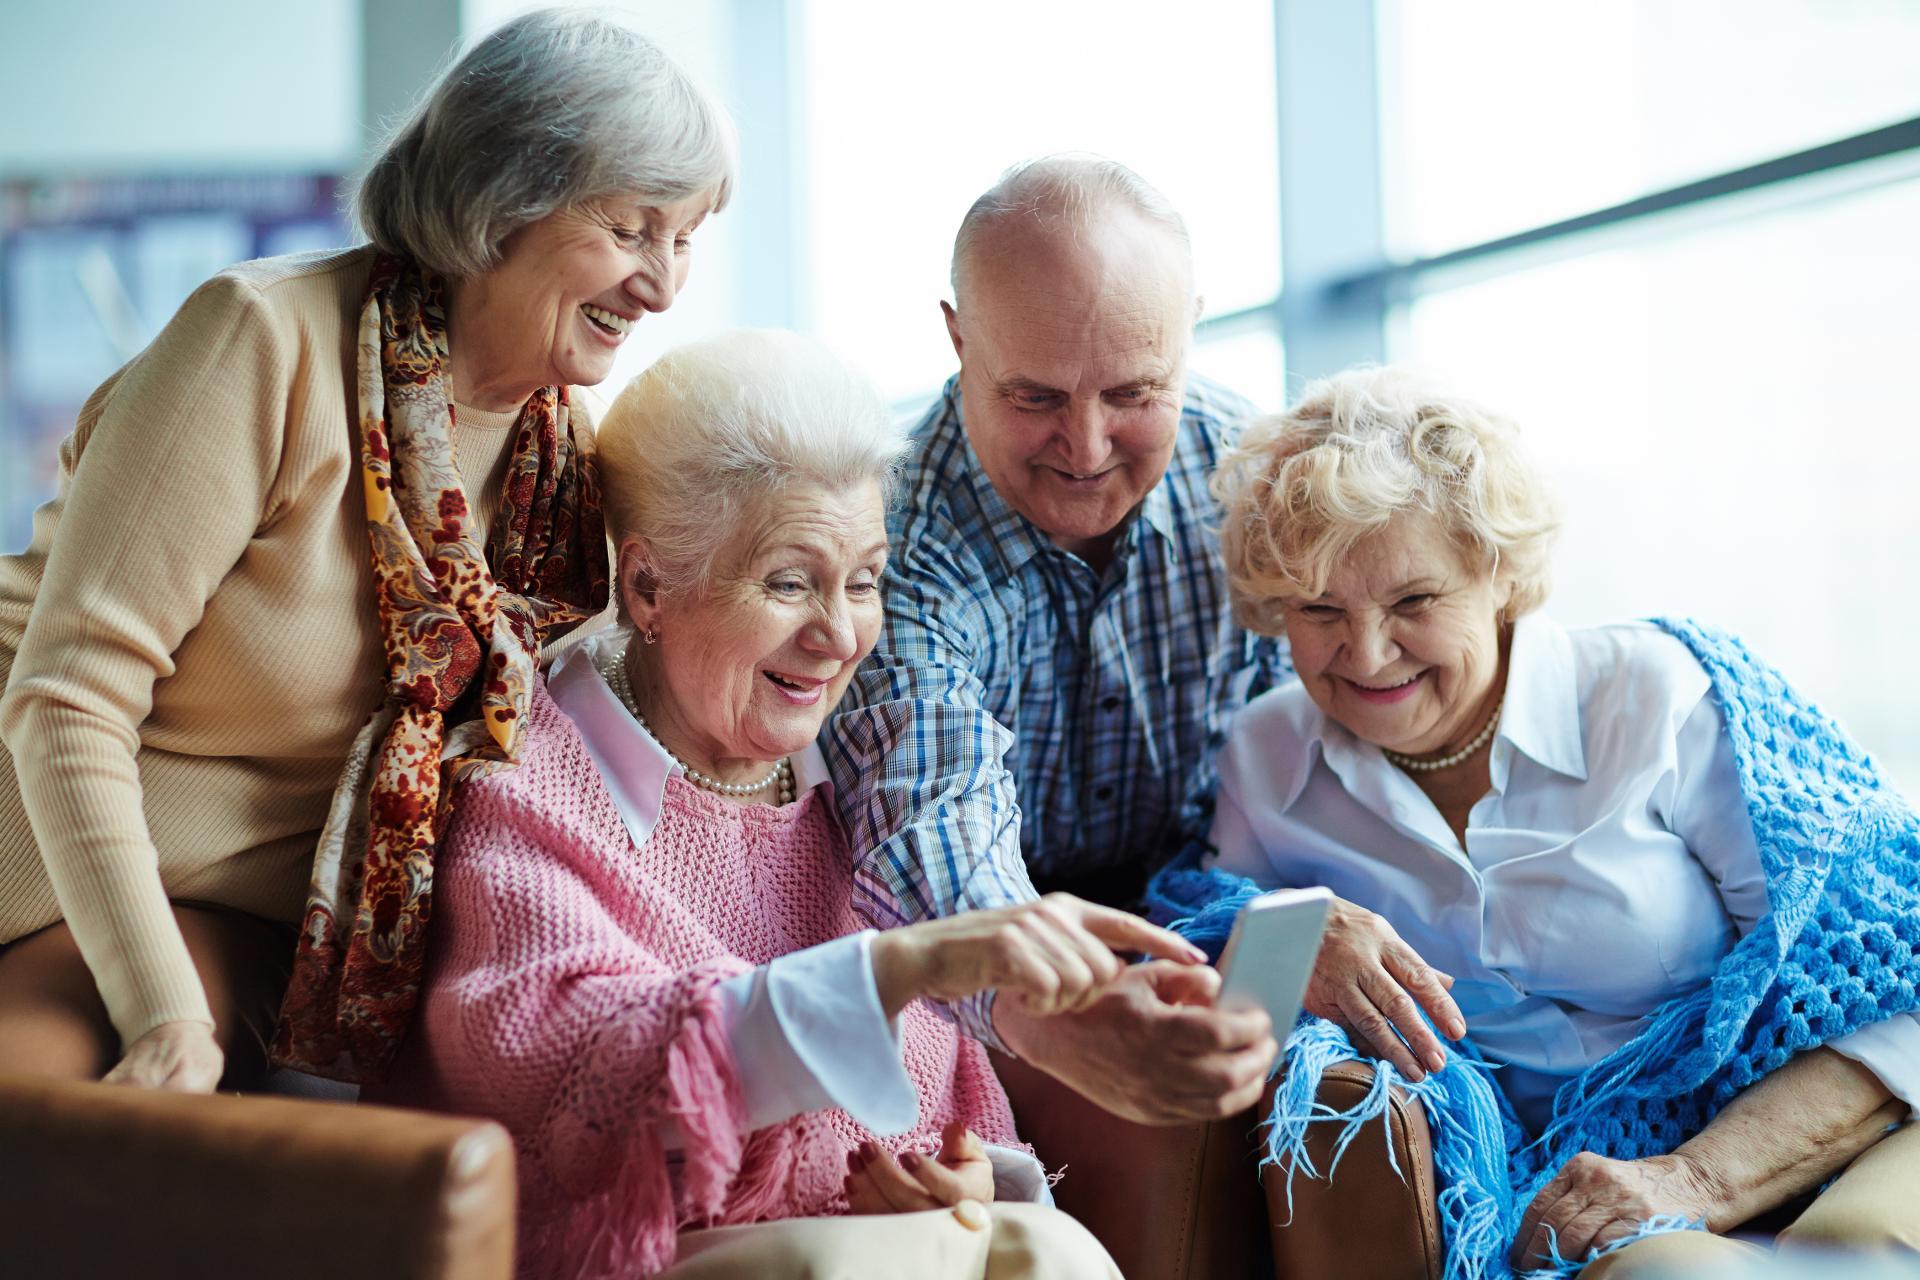 Group of elderly residents enjoying their care home